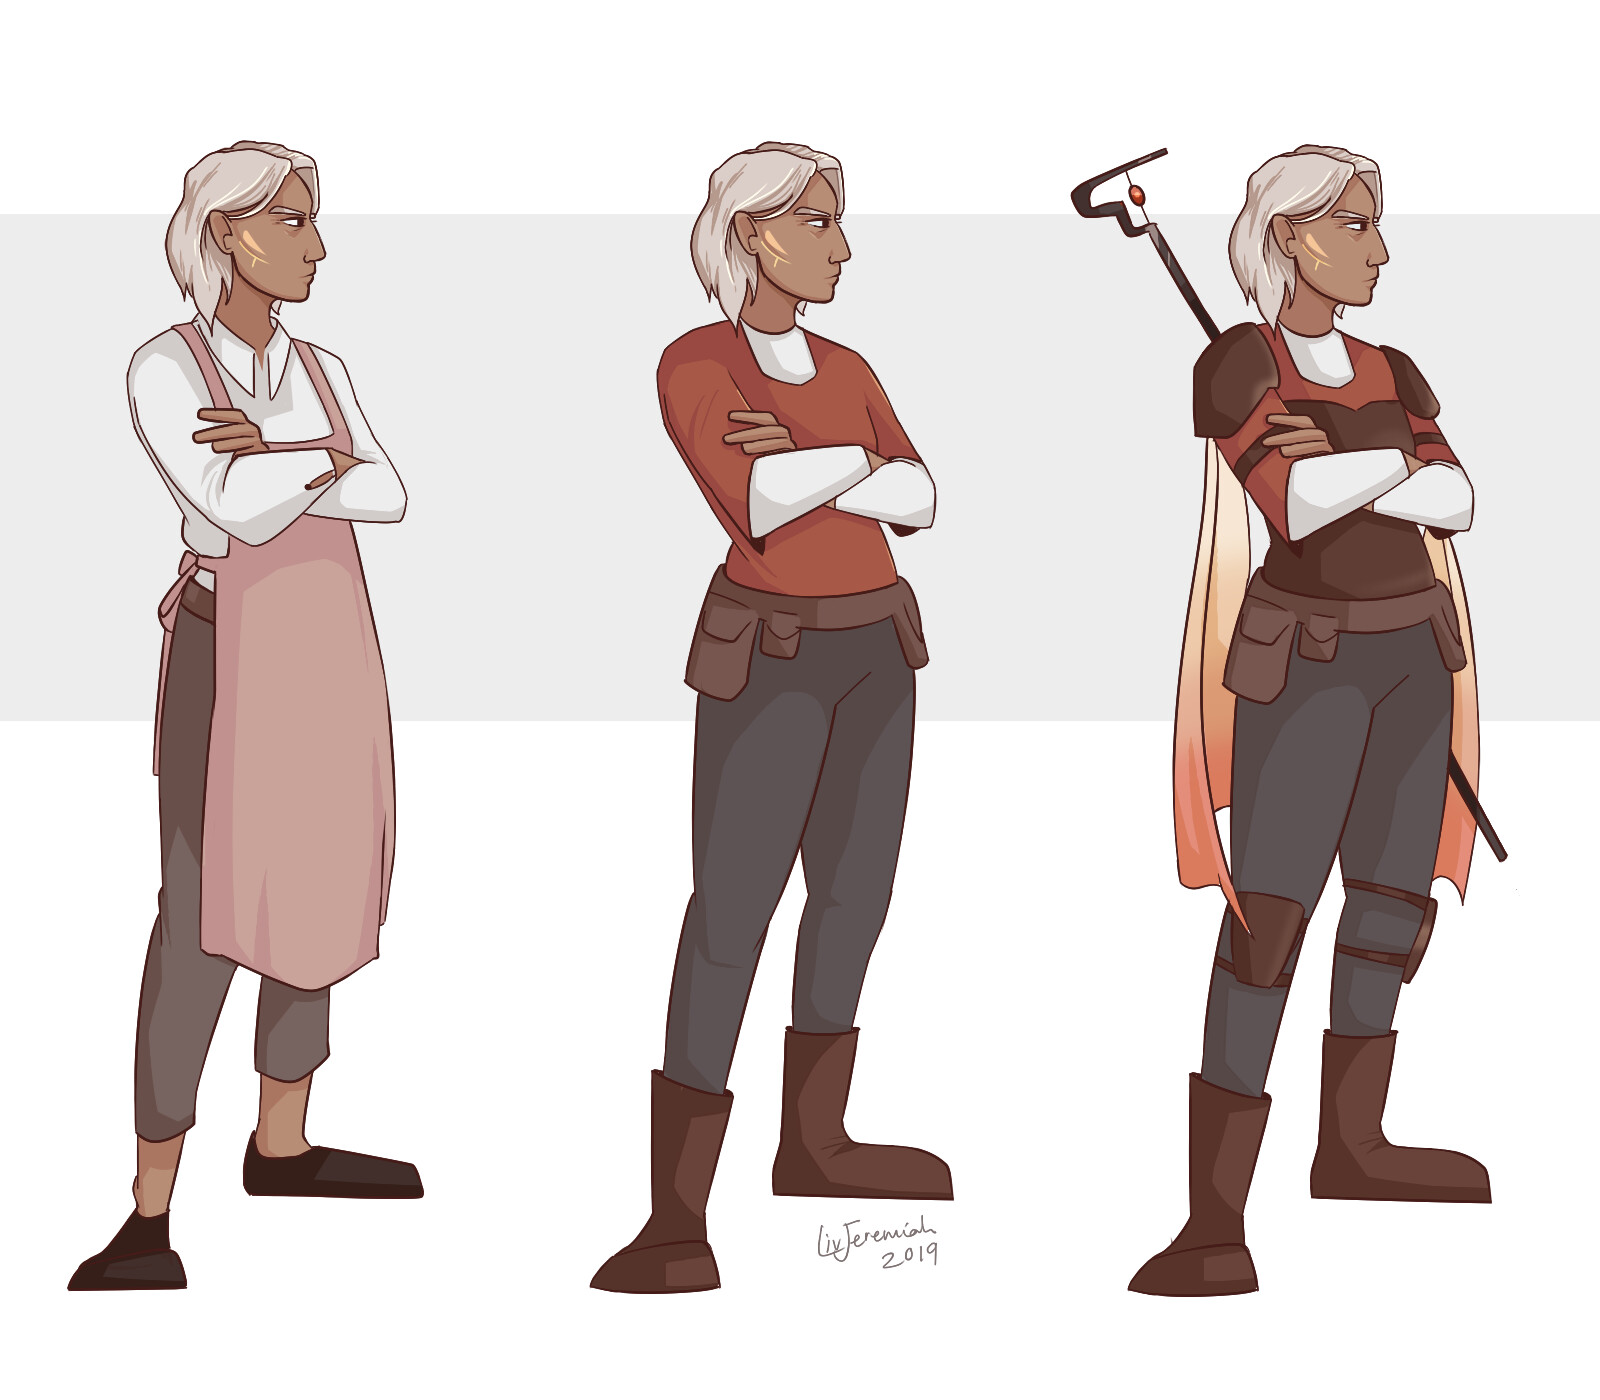 Eyris (D&D Character)